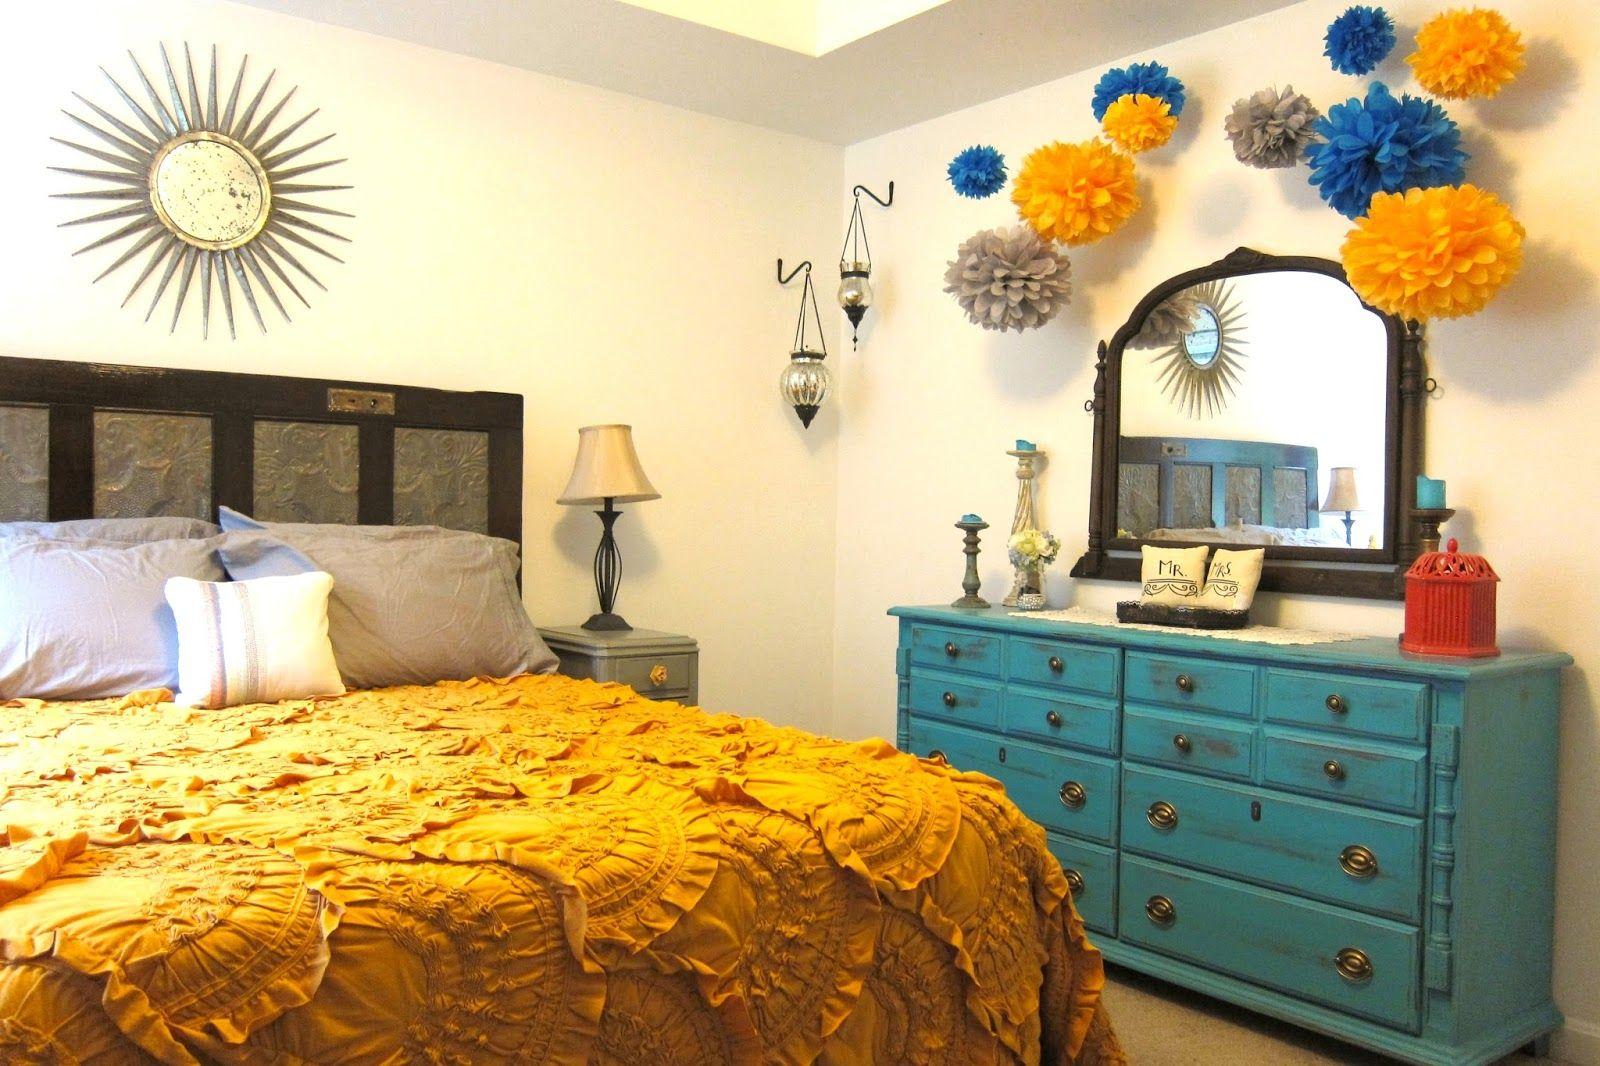 Bohemian Style Bedding | bohemian-style-bedroom-decor-with-elegant ...